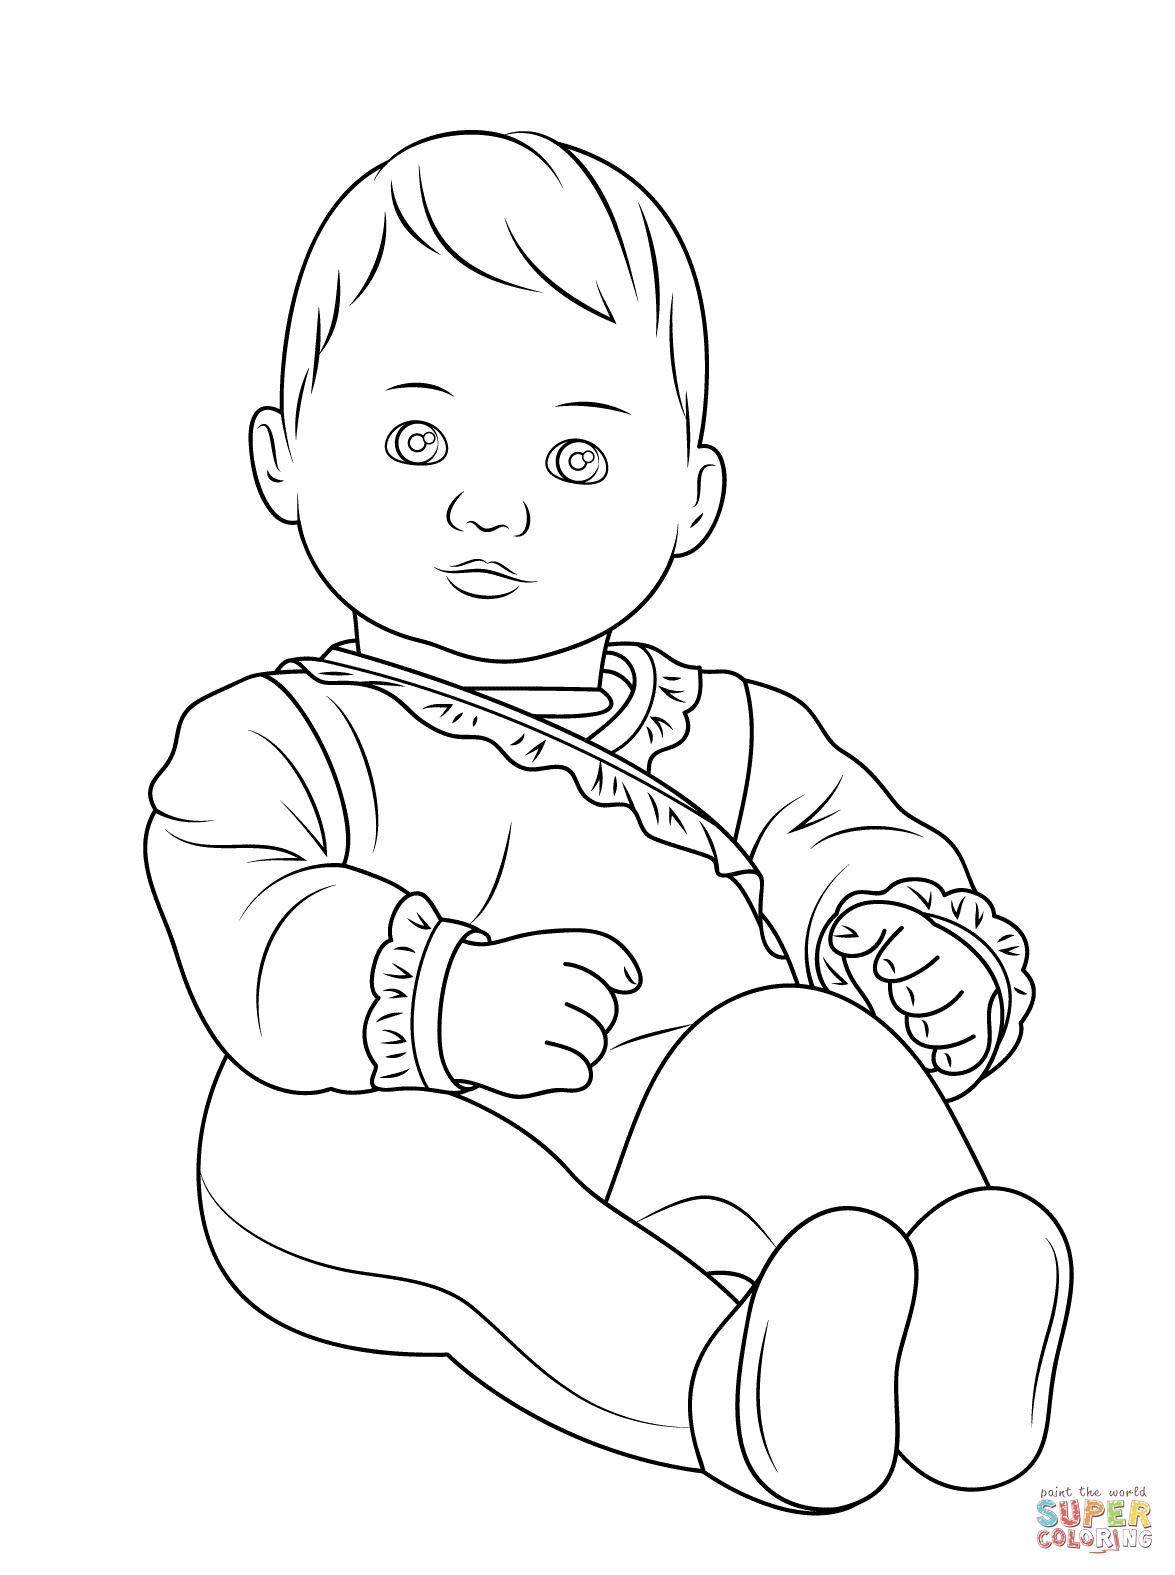 Dall coloring #11, Download drawings